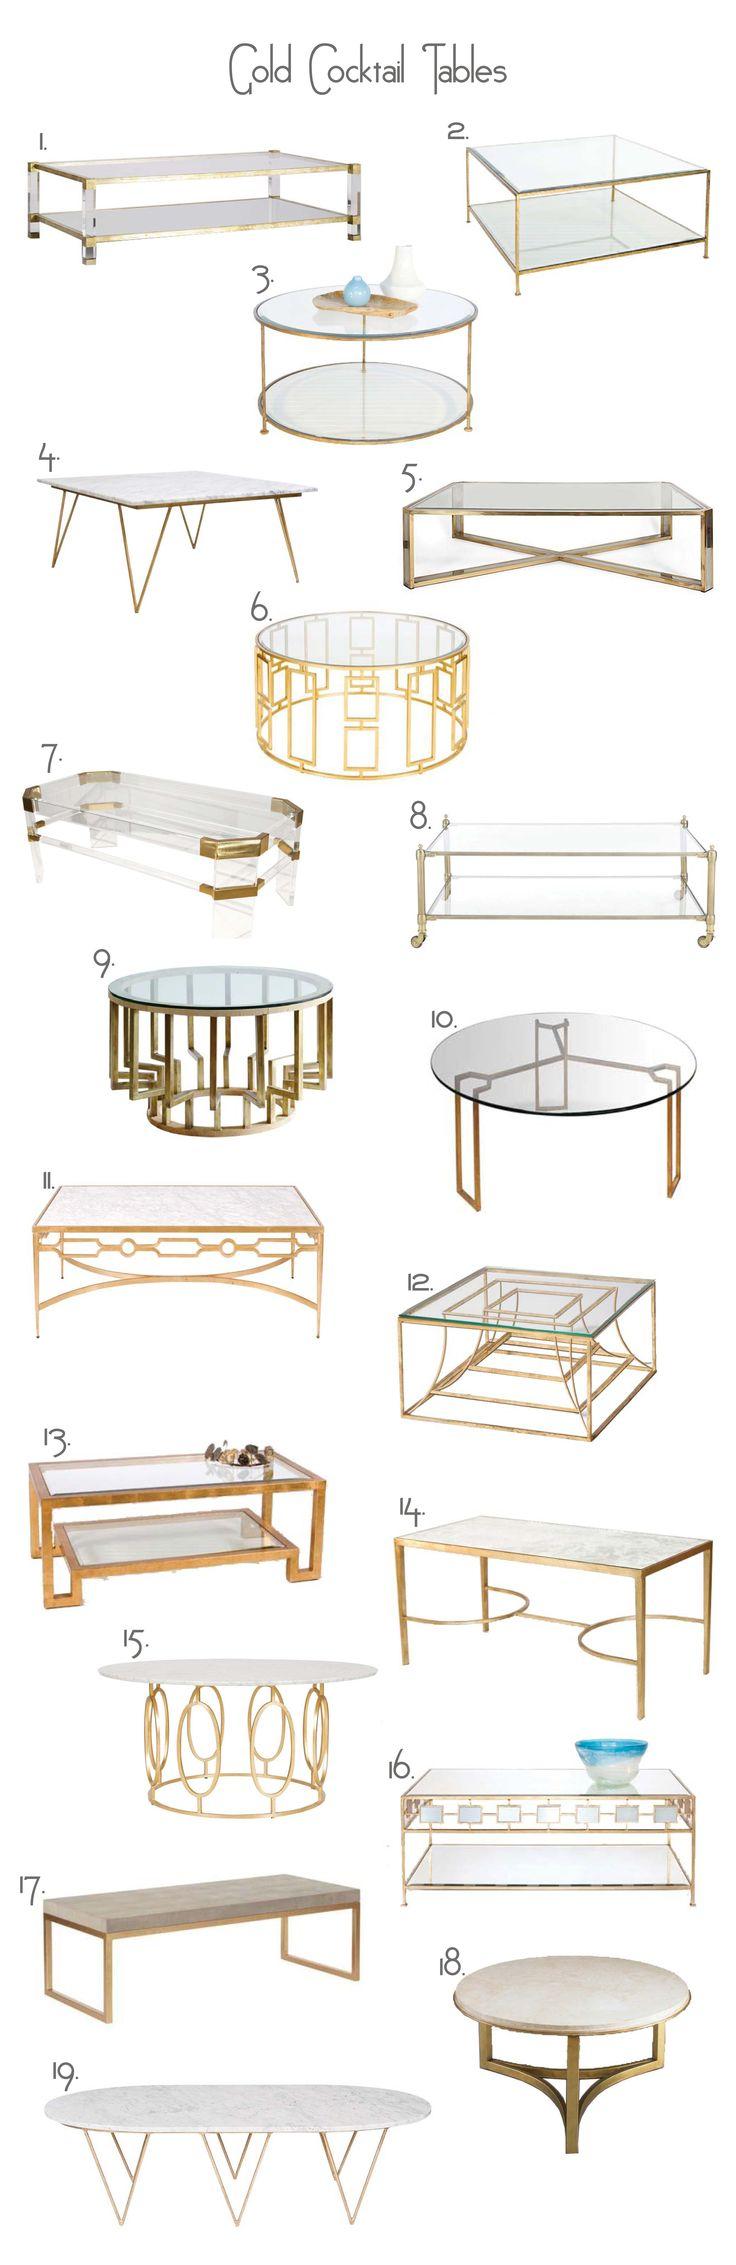 1. Harrison Coffee Table 2. Quadro Gold Leaf Square Coffee Table 3. Rollo Round…